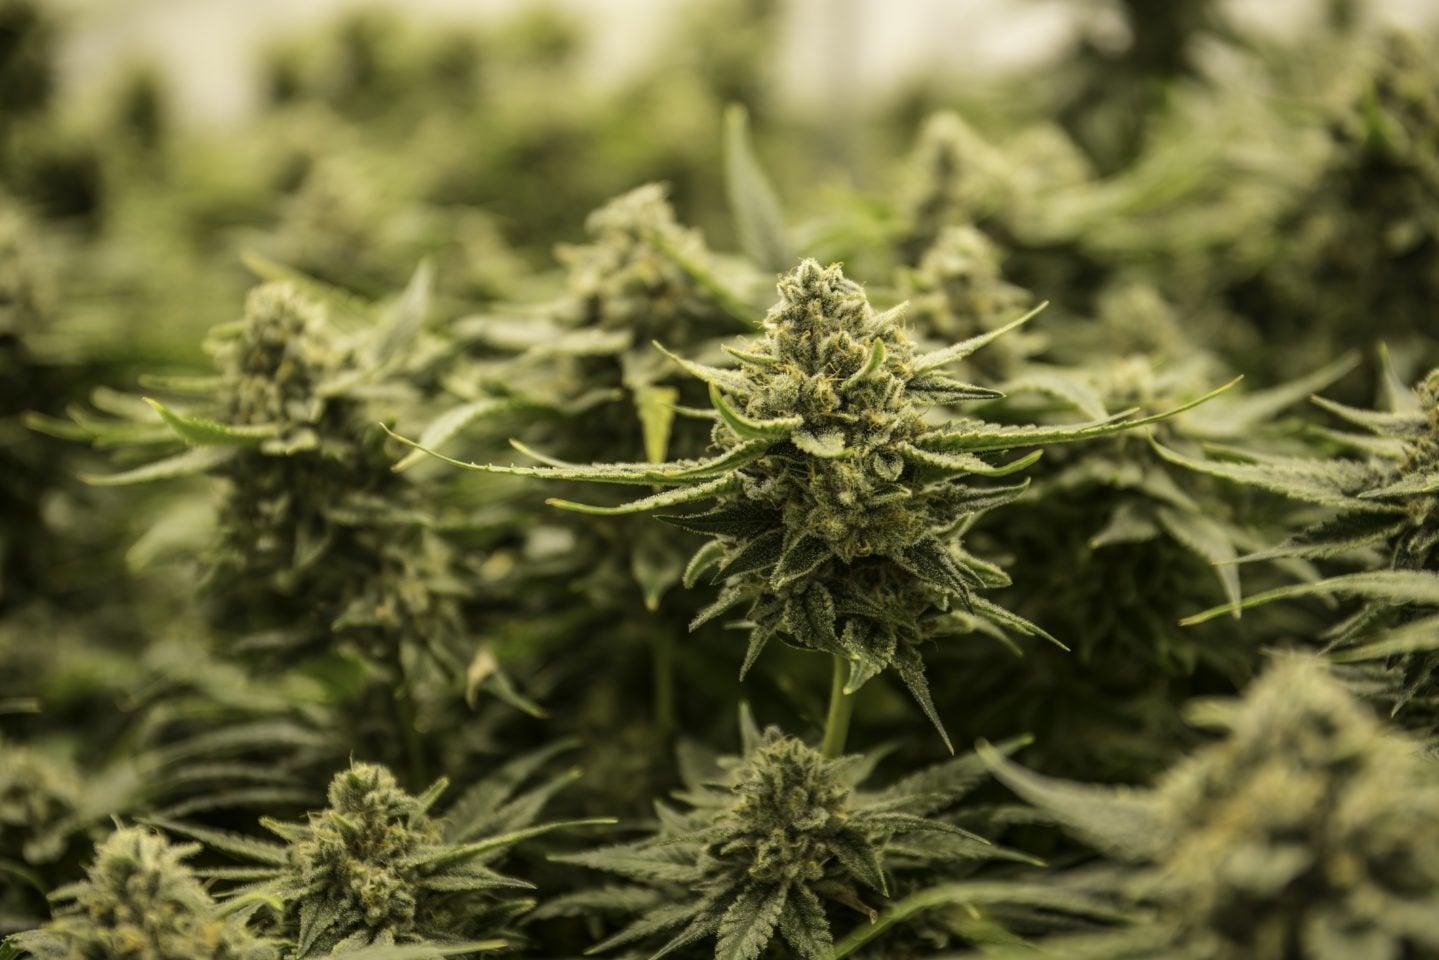 Police Destroy 30,000 Illicit Cannabis Plants In California Raid | High Times